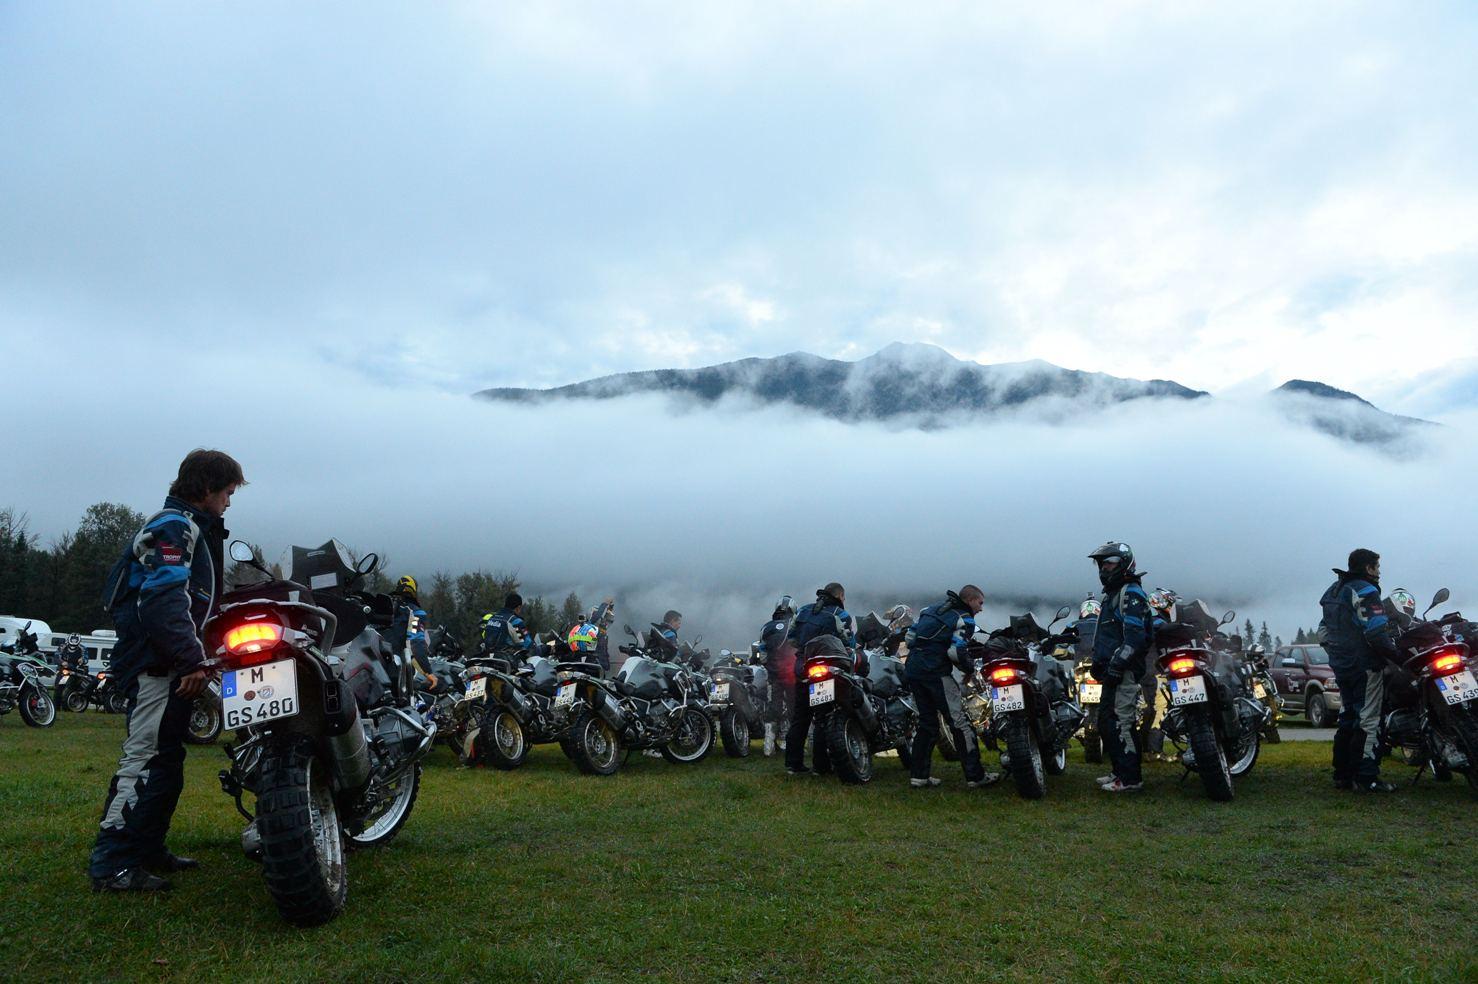 Heated battle at BMW Motorrad International GS Trophy North America 2014